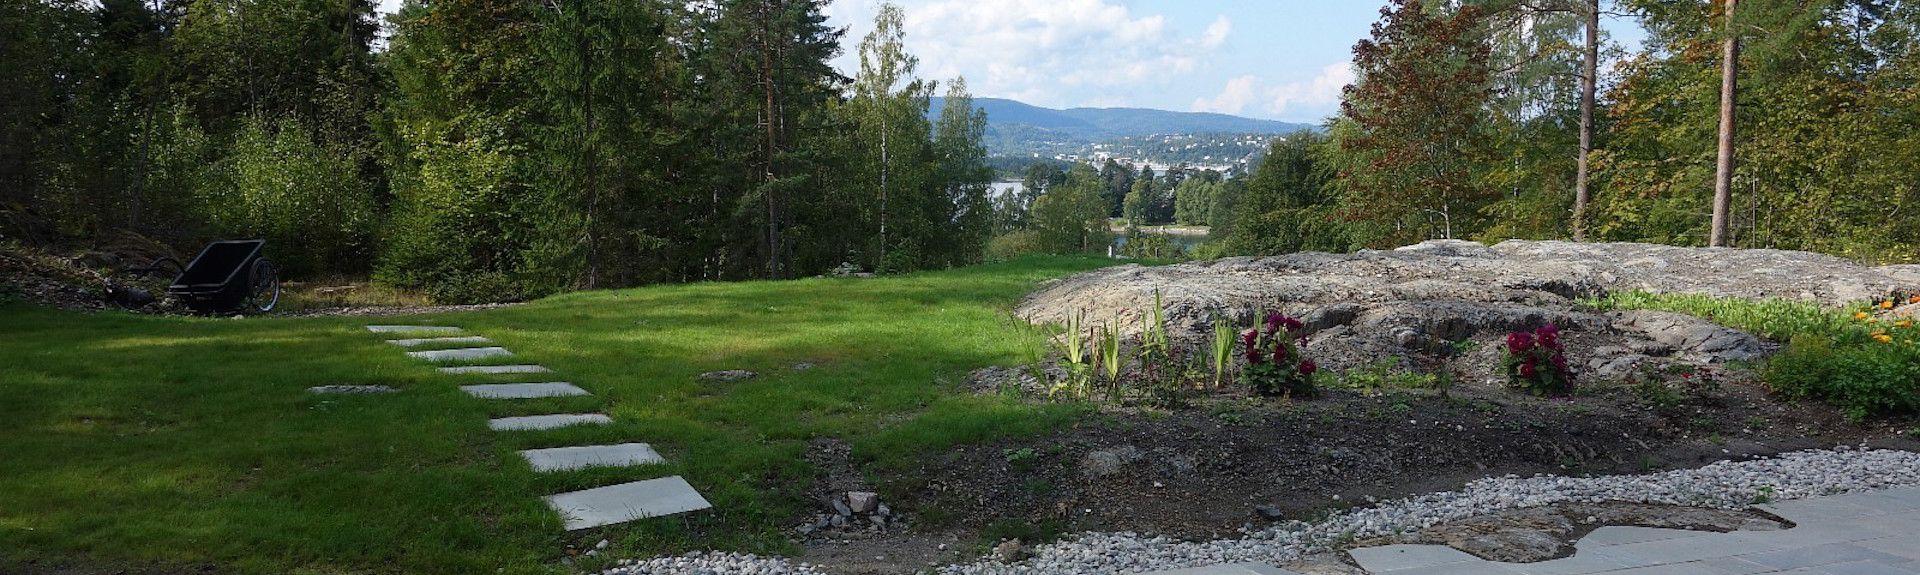 Bærum, Provincie Akershus, Noorwegen